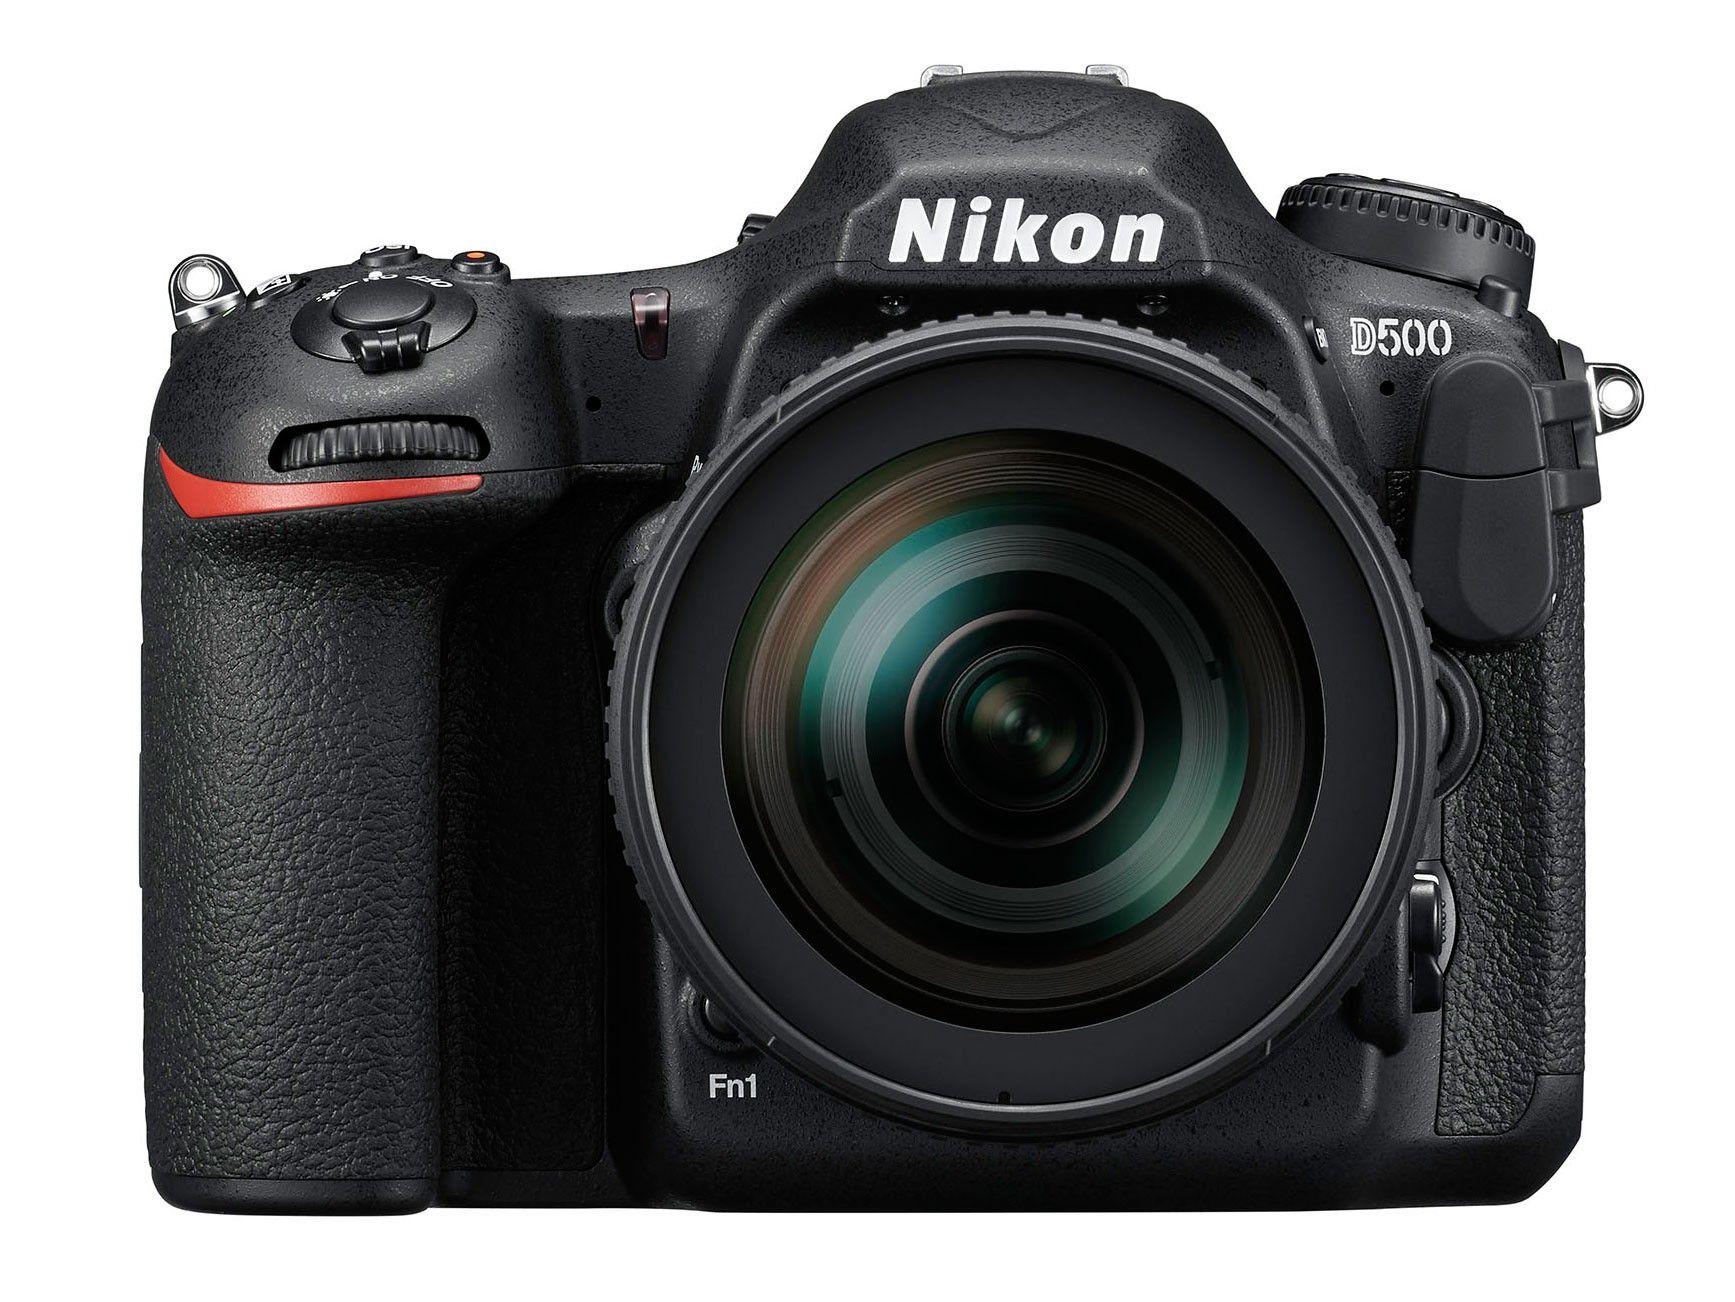 Nikon D500 Body Only Nikon D500 Camera Nikon Dslr Camera